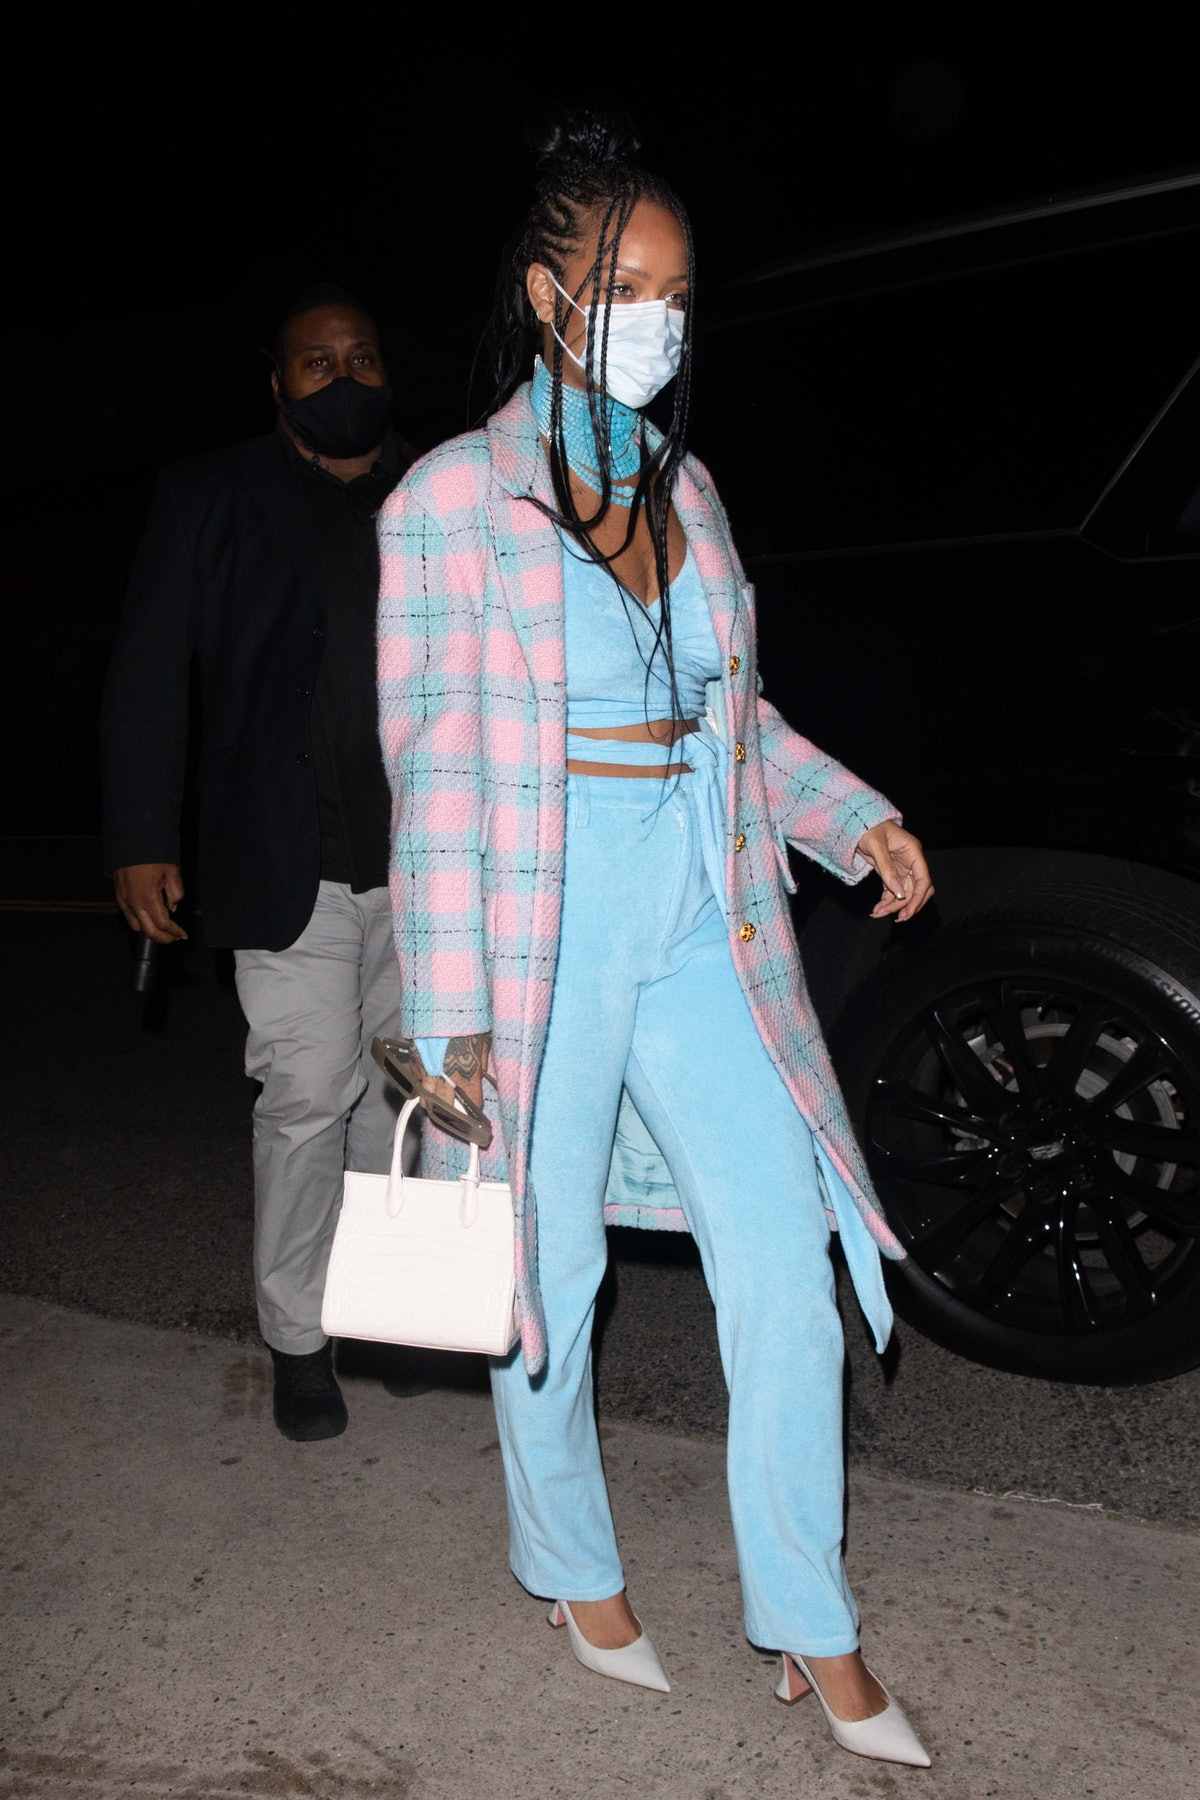 Rihanna arrives at Giorgio Baldi on March 19, 2021 in Los Angeles, California. (Photo by iamKevinWong.com/MEGA/GC Images)